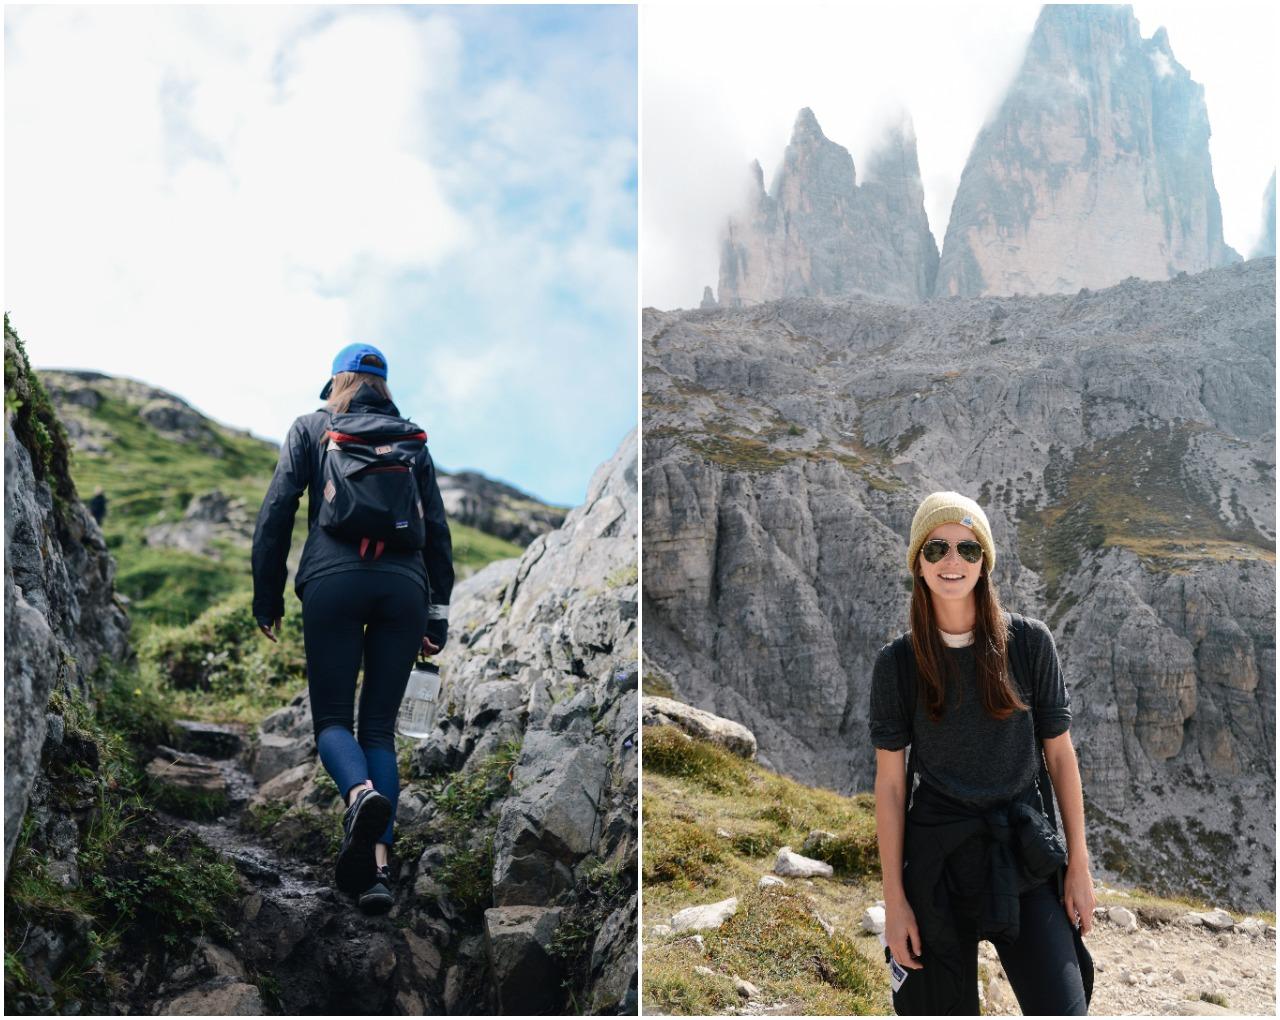 outdoor-voice-active-travel-adventure-gear-clothing-lifeonpine-3.jpg